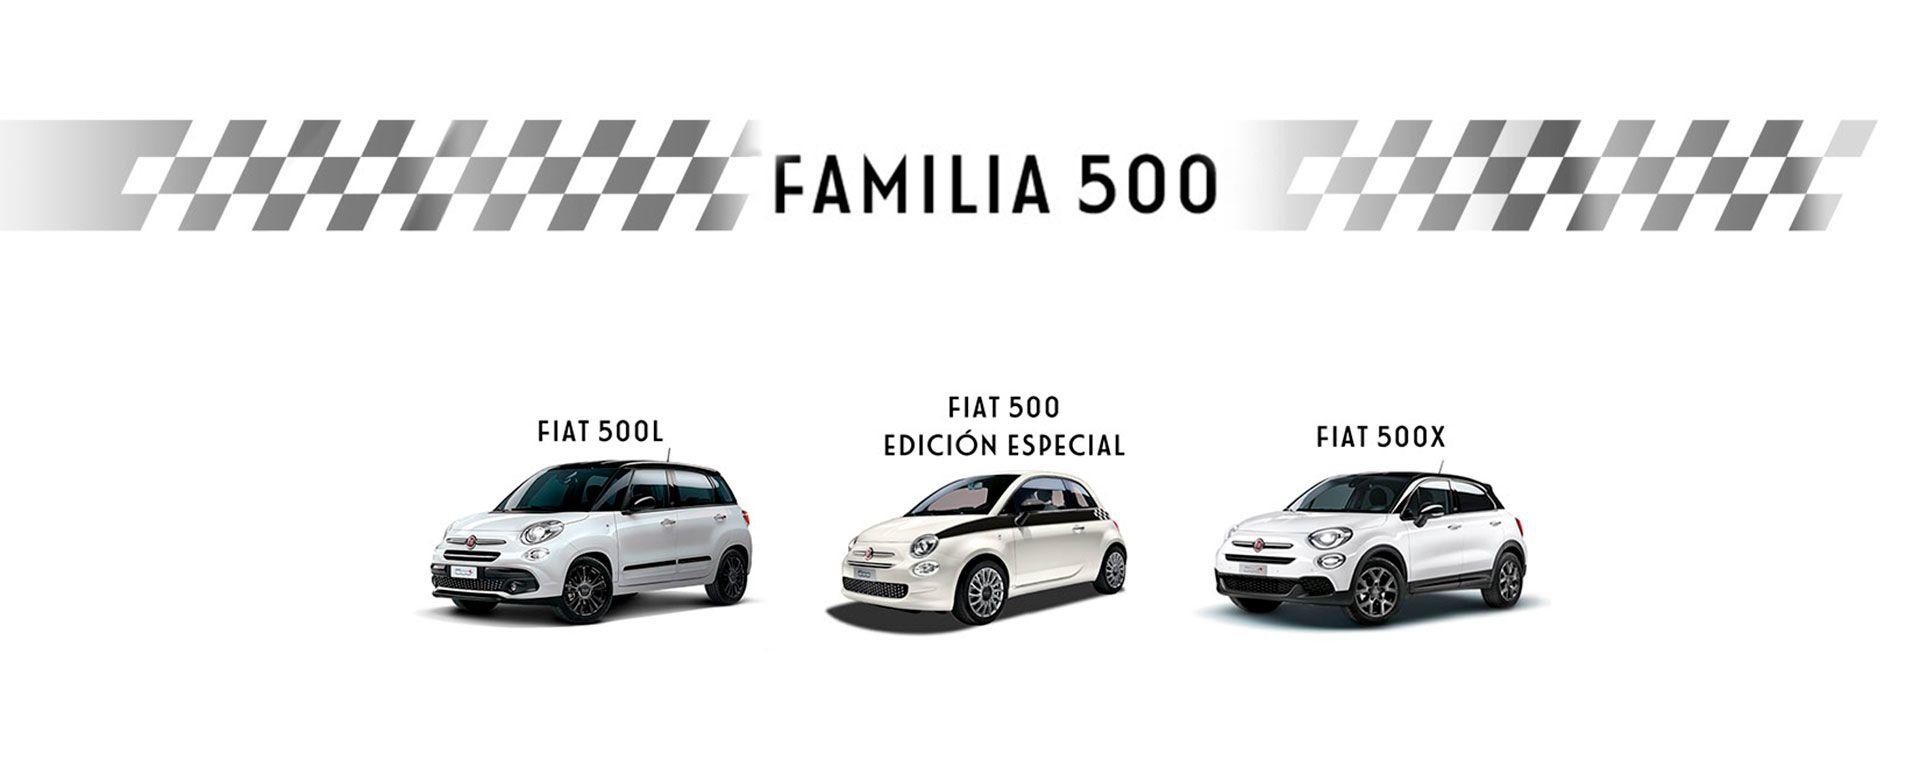 FAMILIA 500